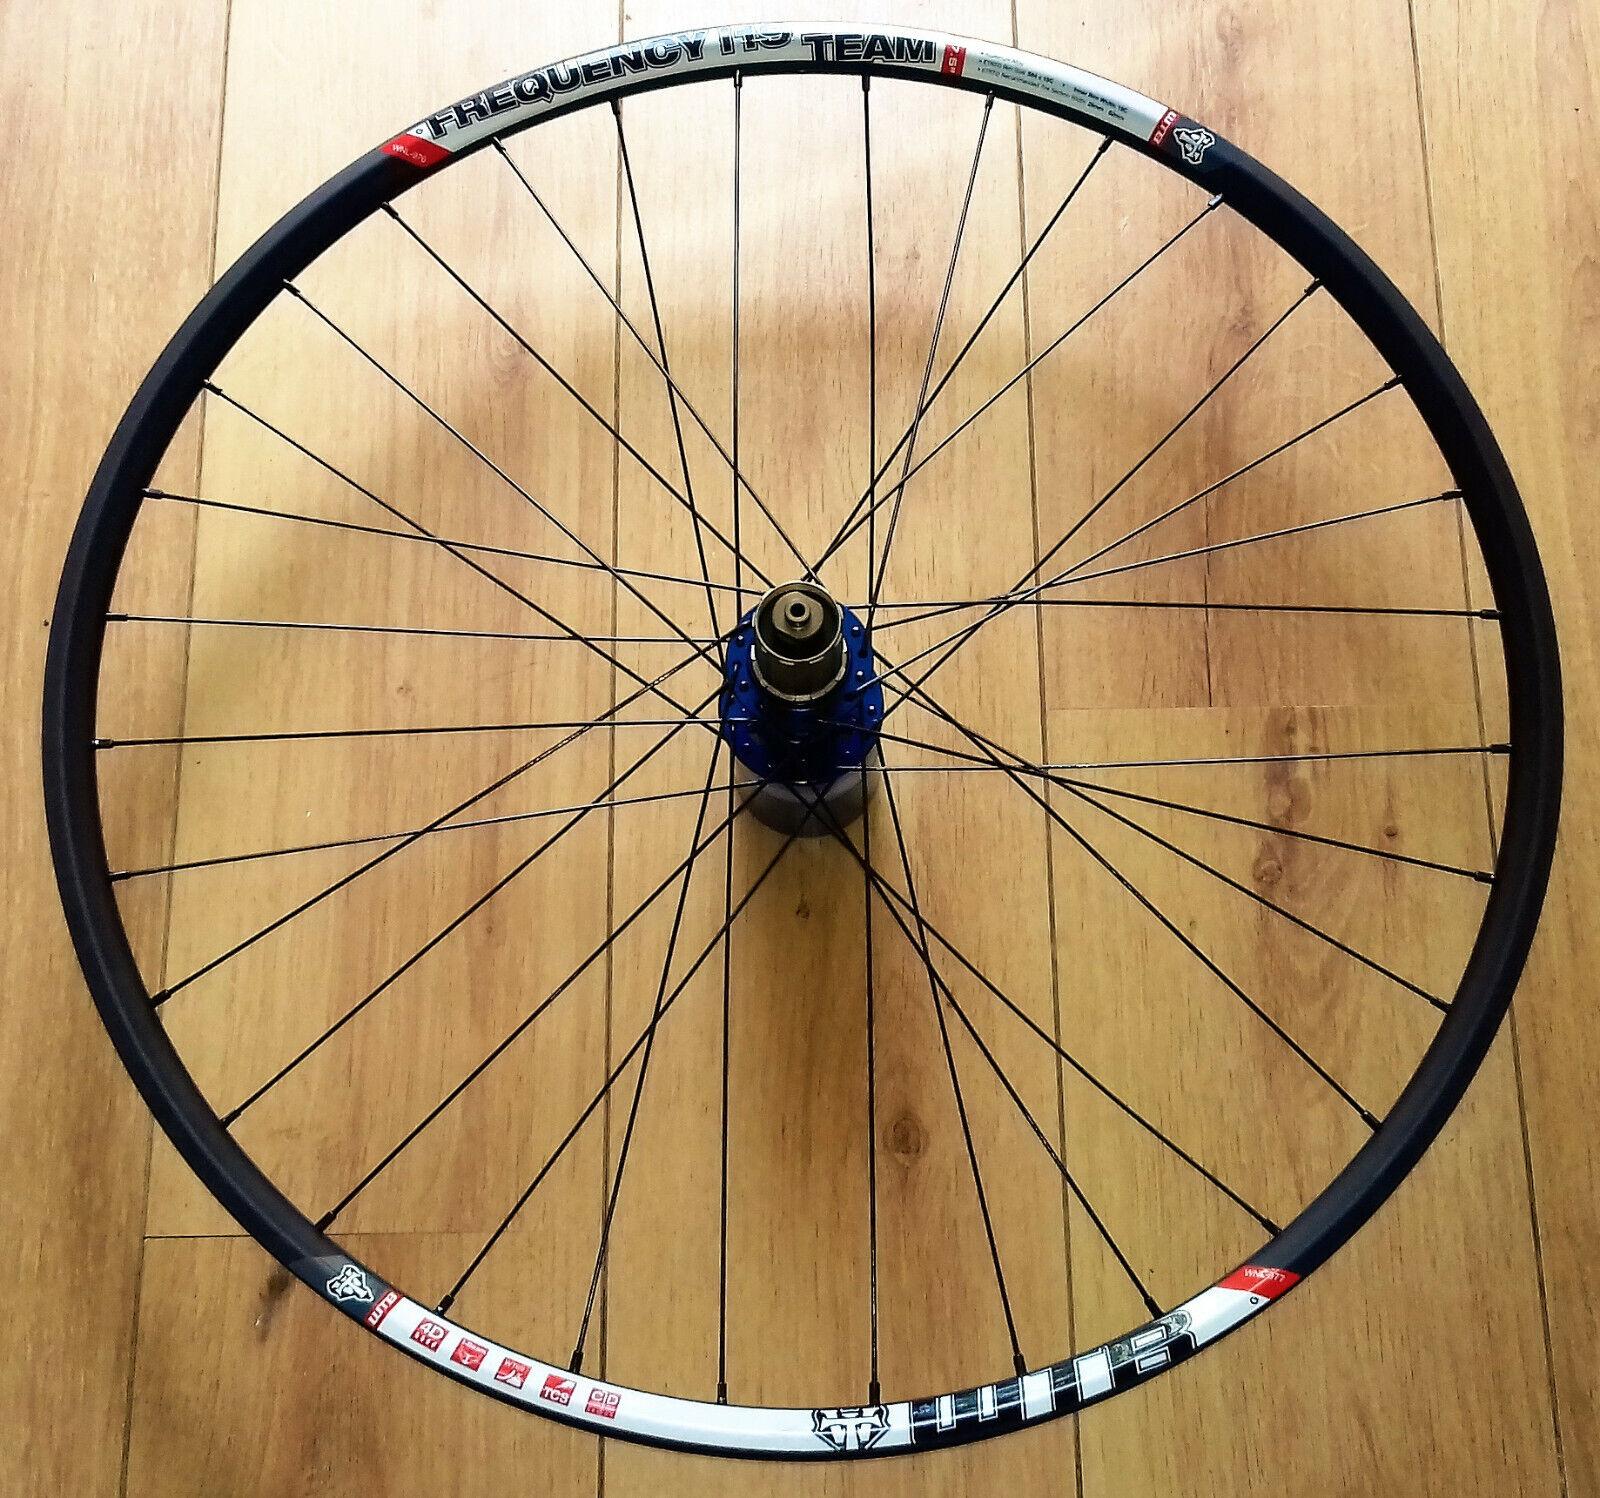 27.5  WTB Frequency i19 Rim,bluee  Novatec D792SB Hub Rear Wheel,Sapim Race Spokes  best choice